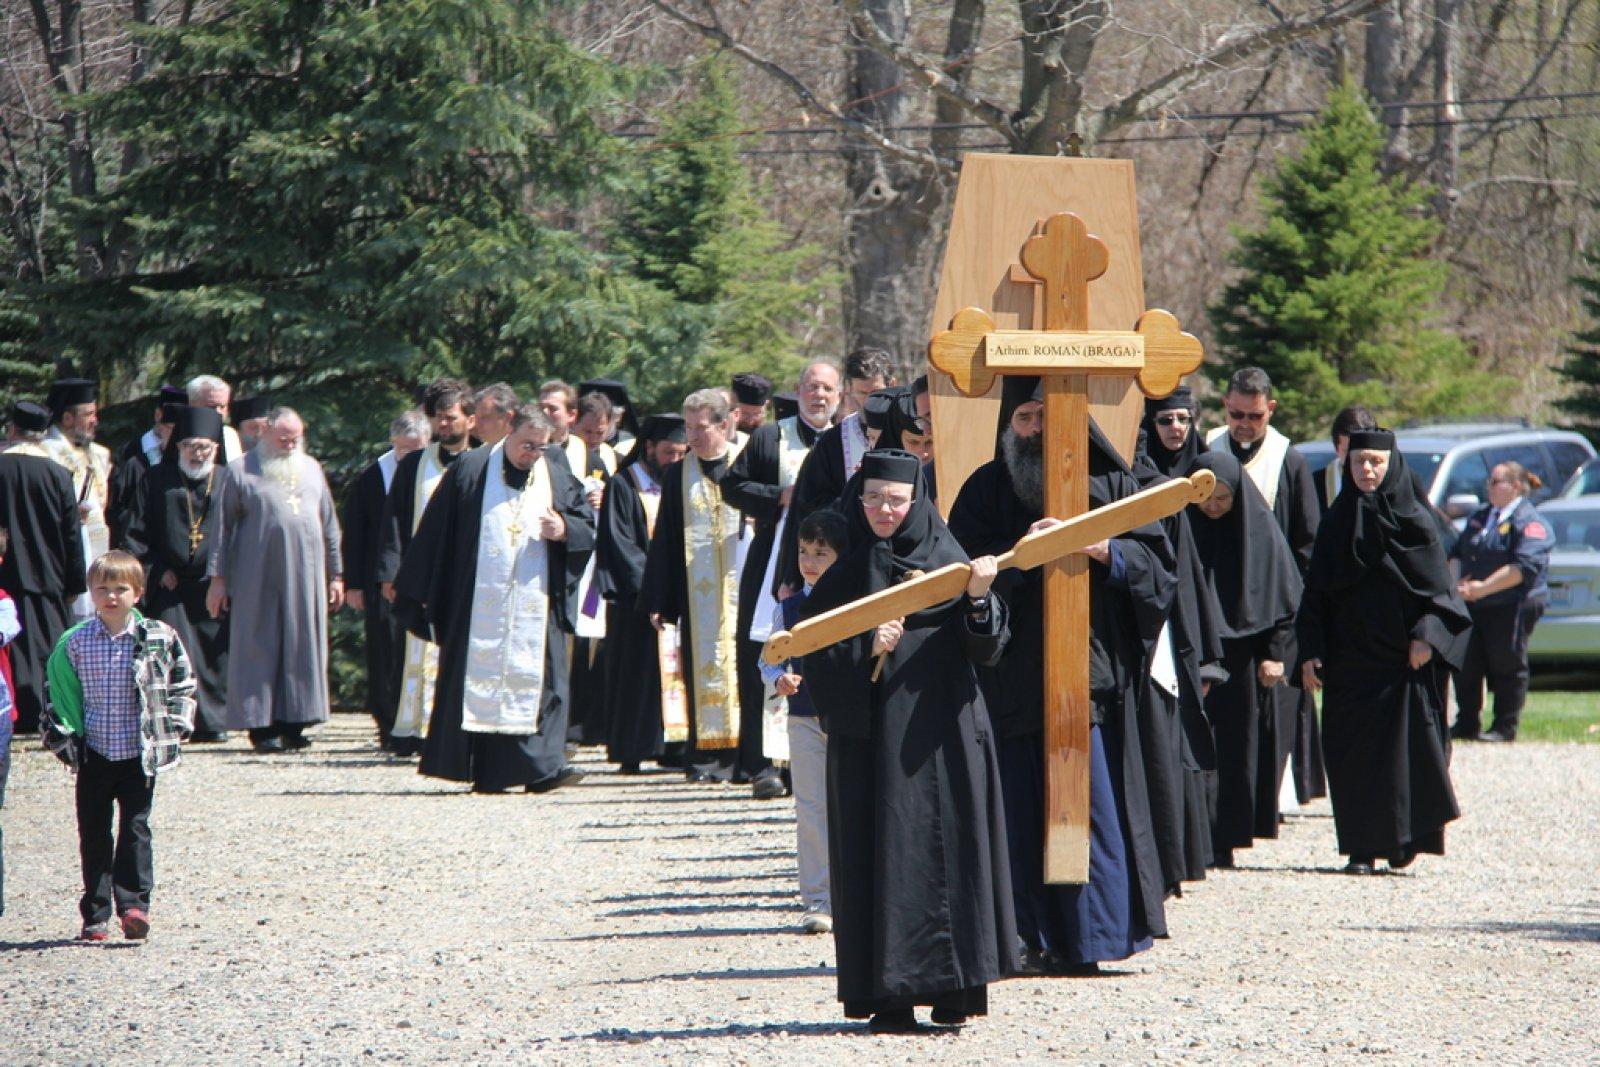 Inmormantare Parintele Roman Braga 29 aprilie 2015 4